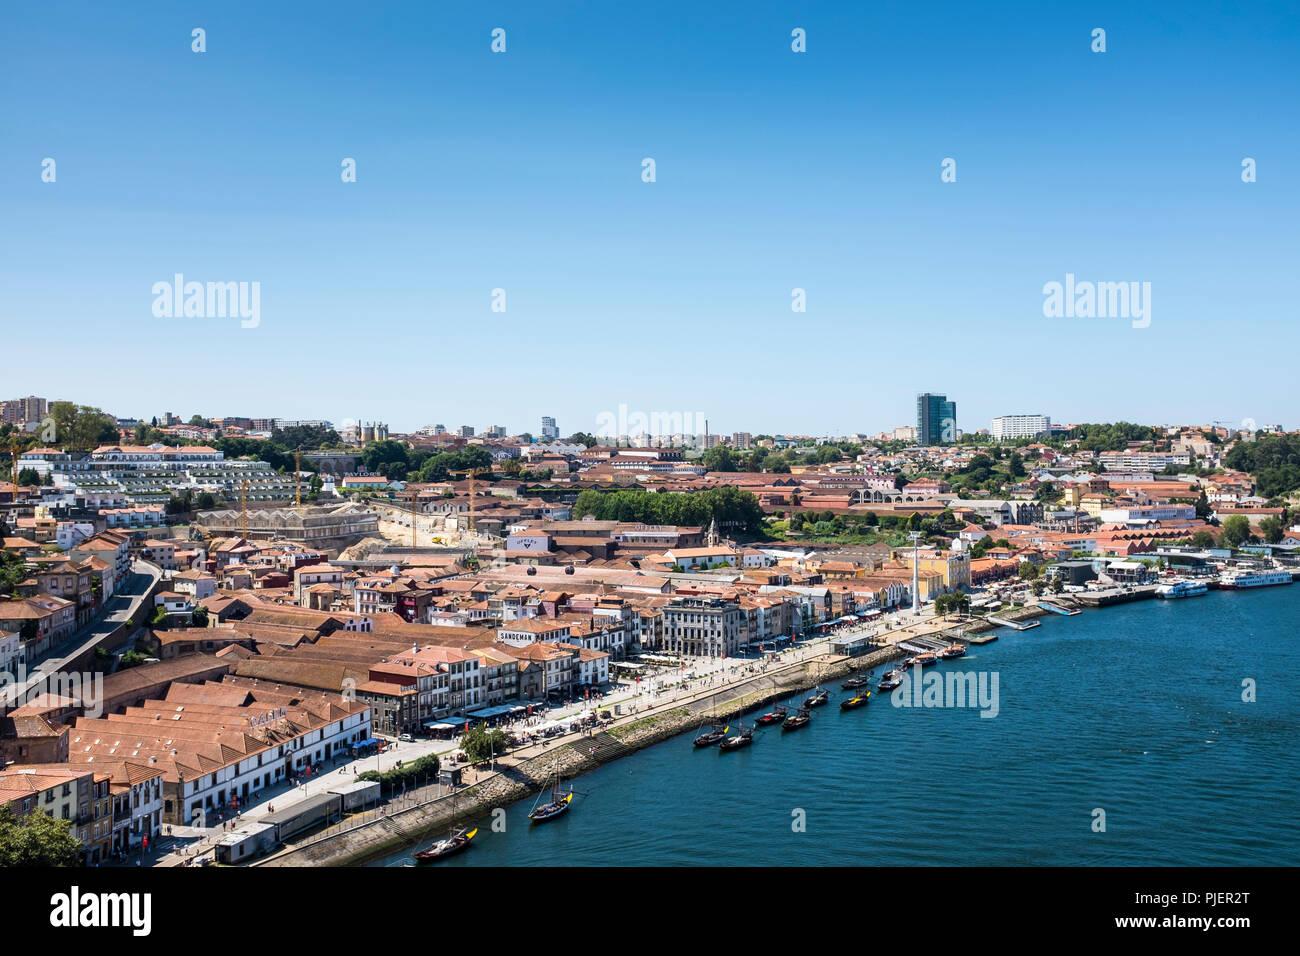 View from the Luis 1 bridge, Porto, looking over the port houses of Vila Nova de Gaia. Stock Photo